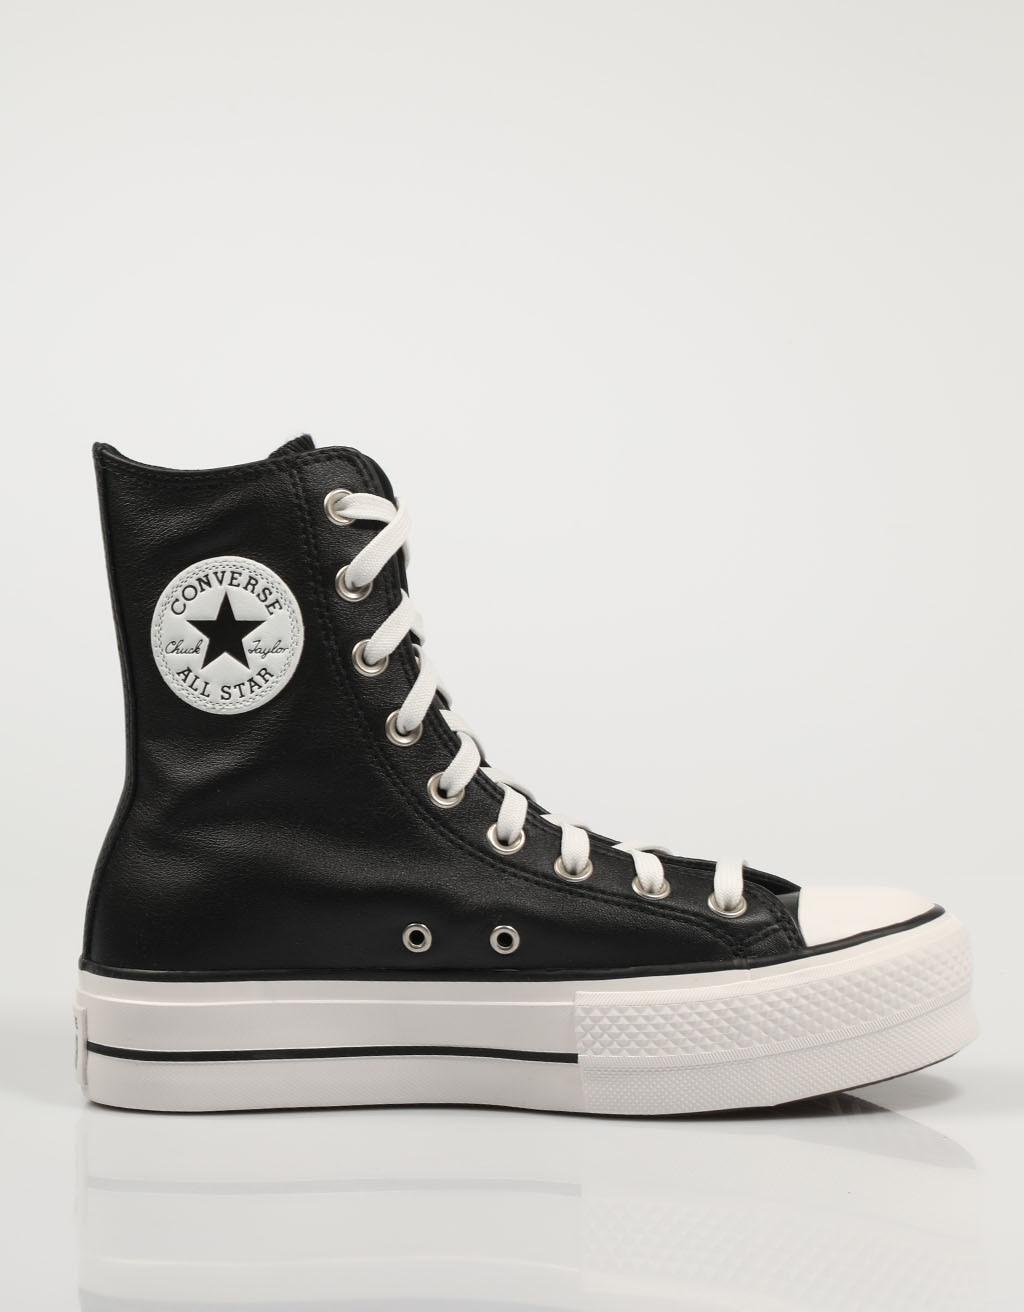 CONVERSE ZAPATILLAS CTAS LIFT BLACK 569721C Negro Piel Mujer – Black SNEAKERS Woman Shoes Casual Fashion 76534